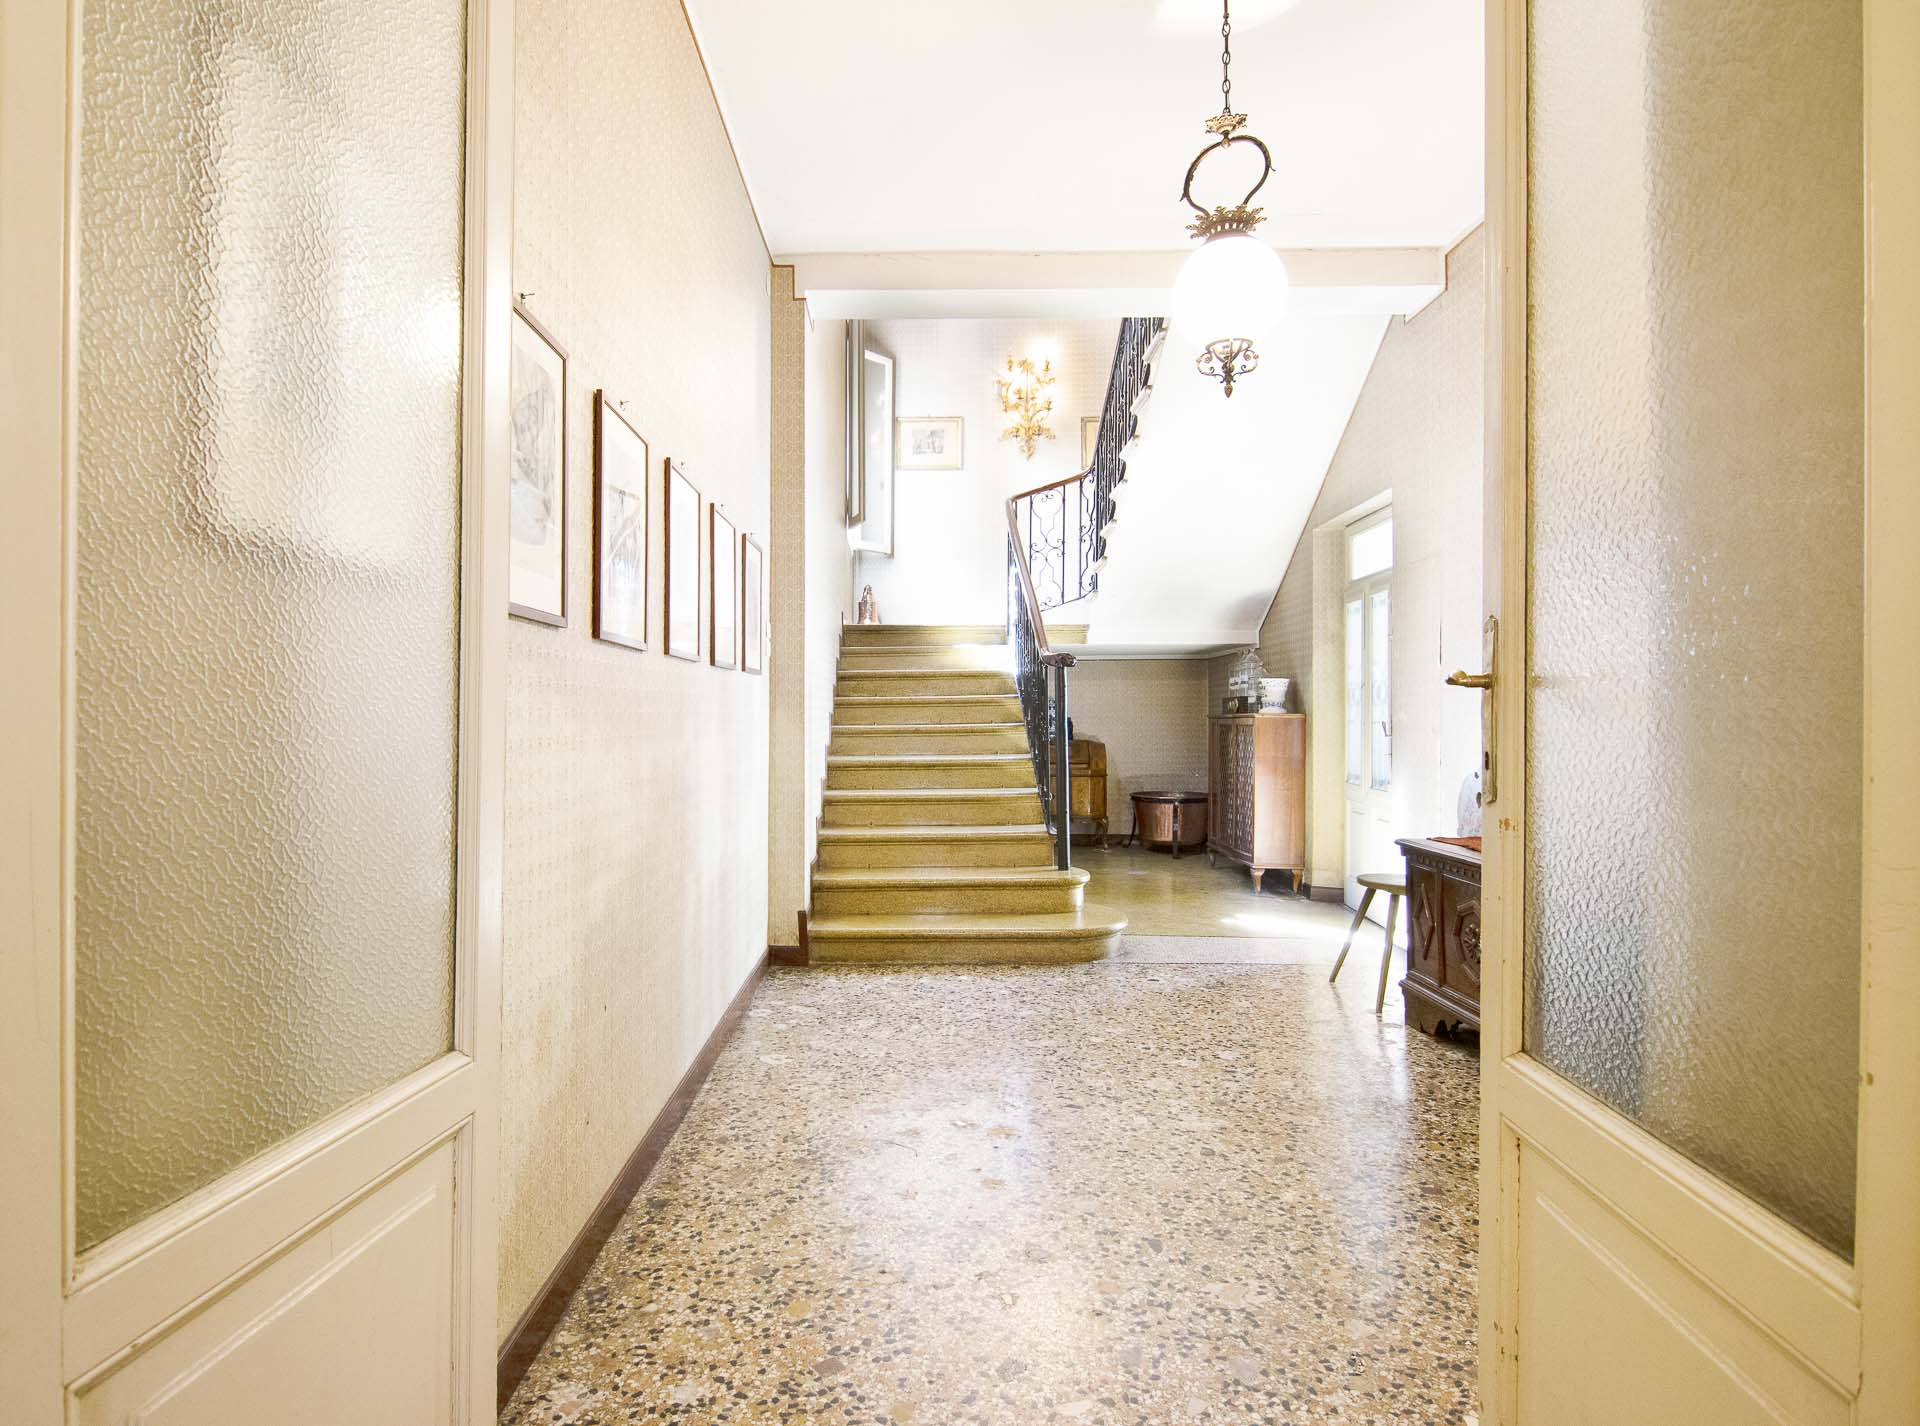 Edificio storico a Vittorio Veneto